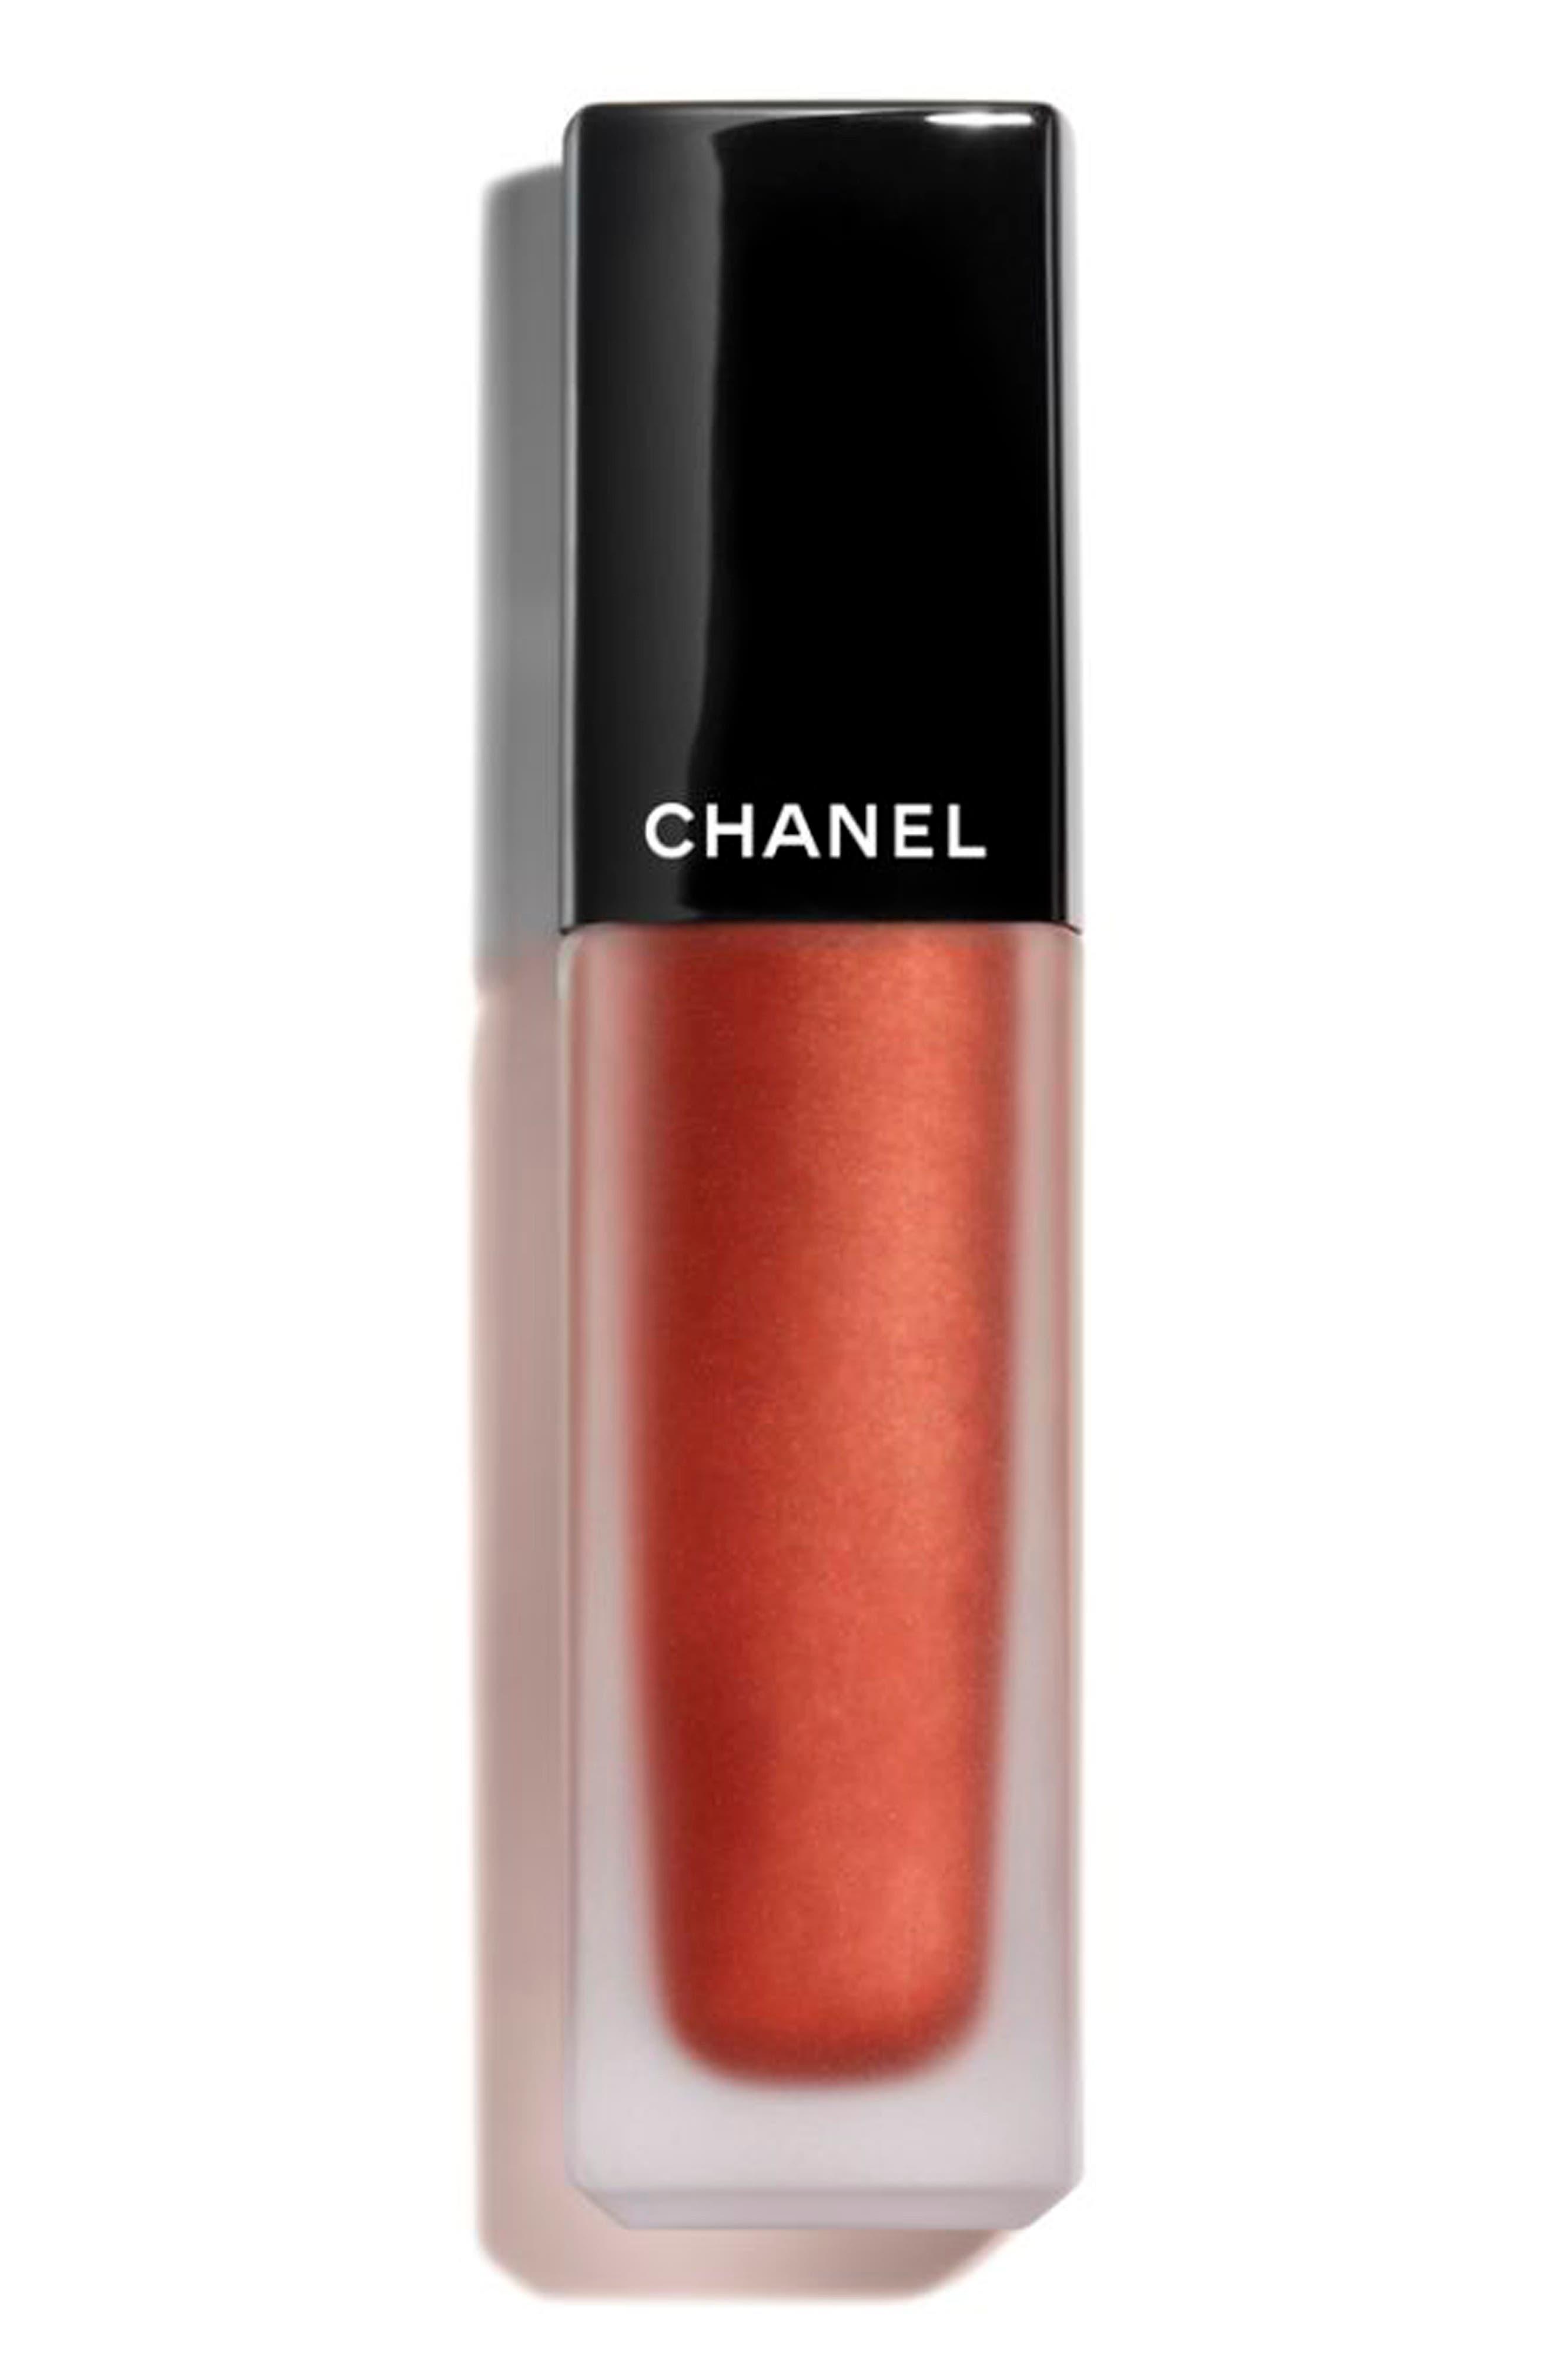 CHANEL ROUGE ALLURE INK  Matte Liquid Lip Color | Nordstrom